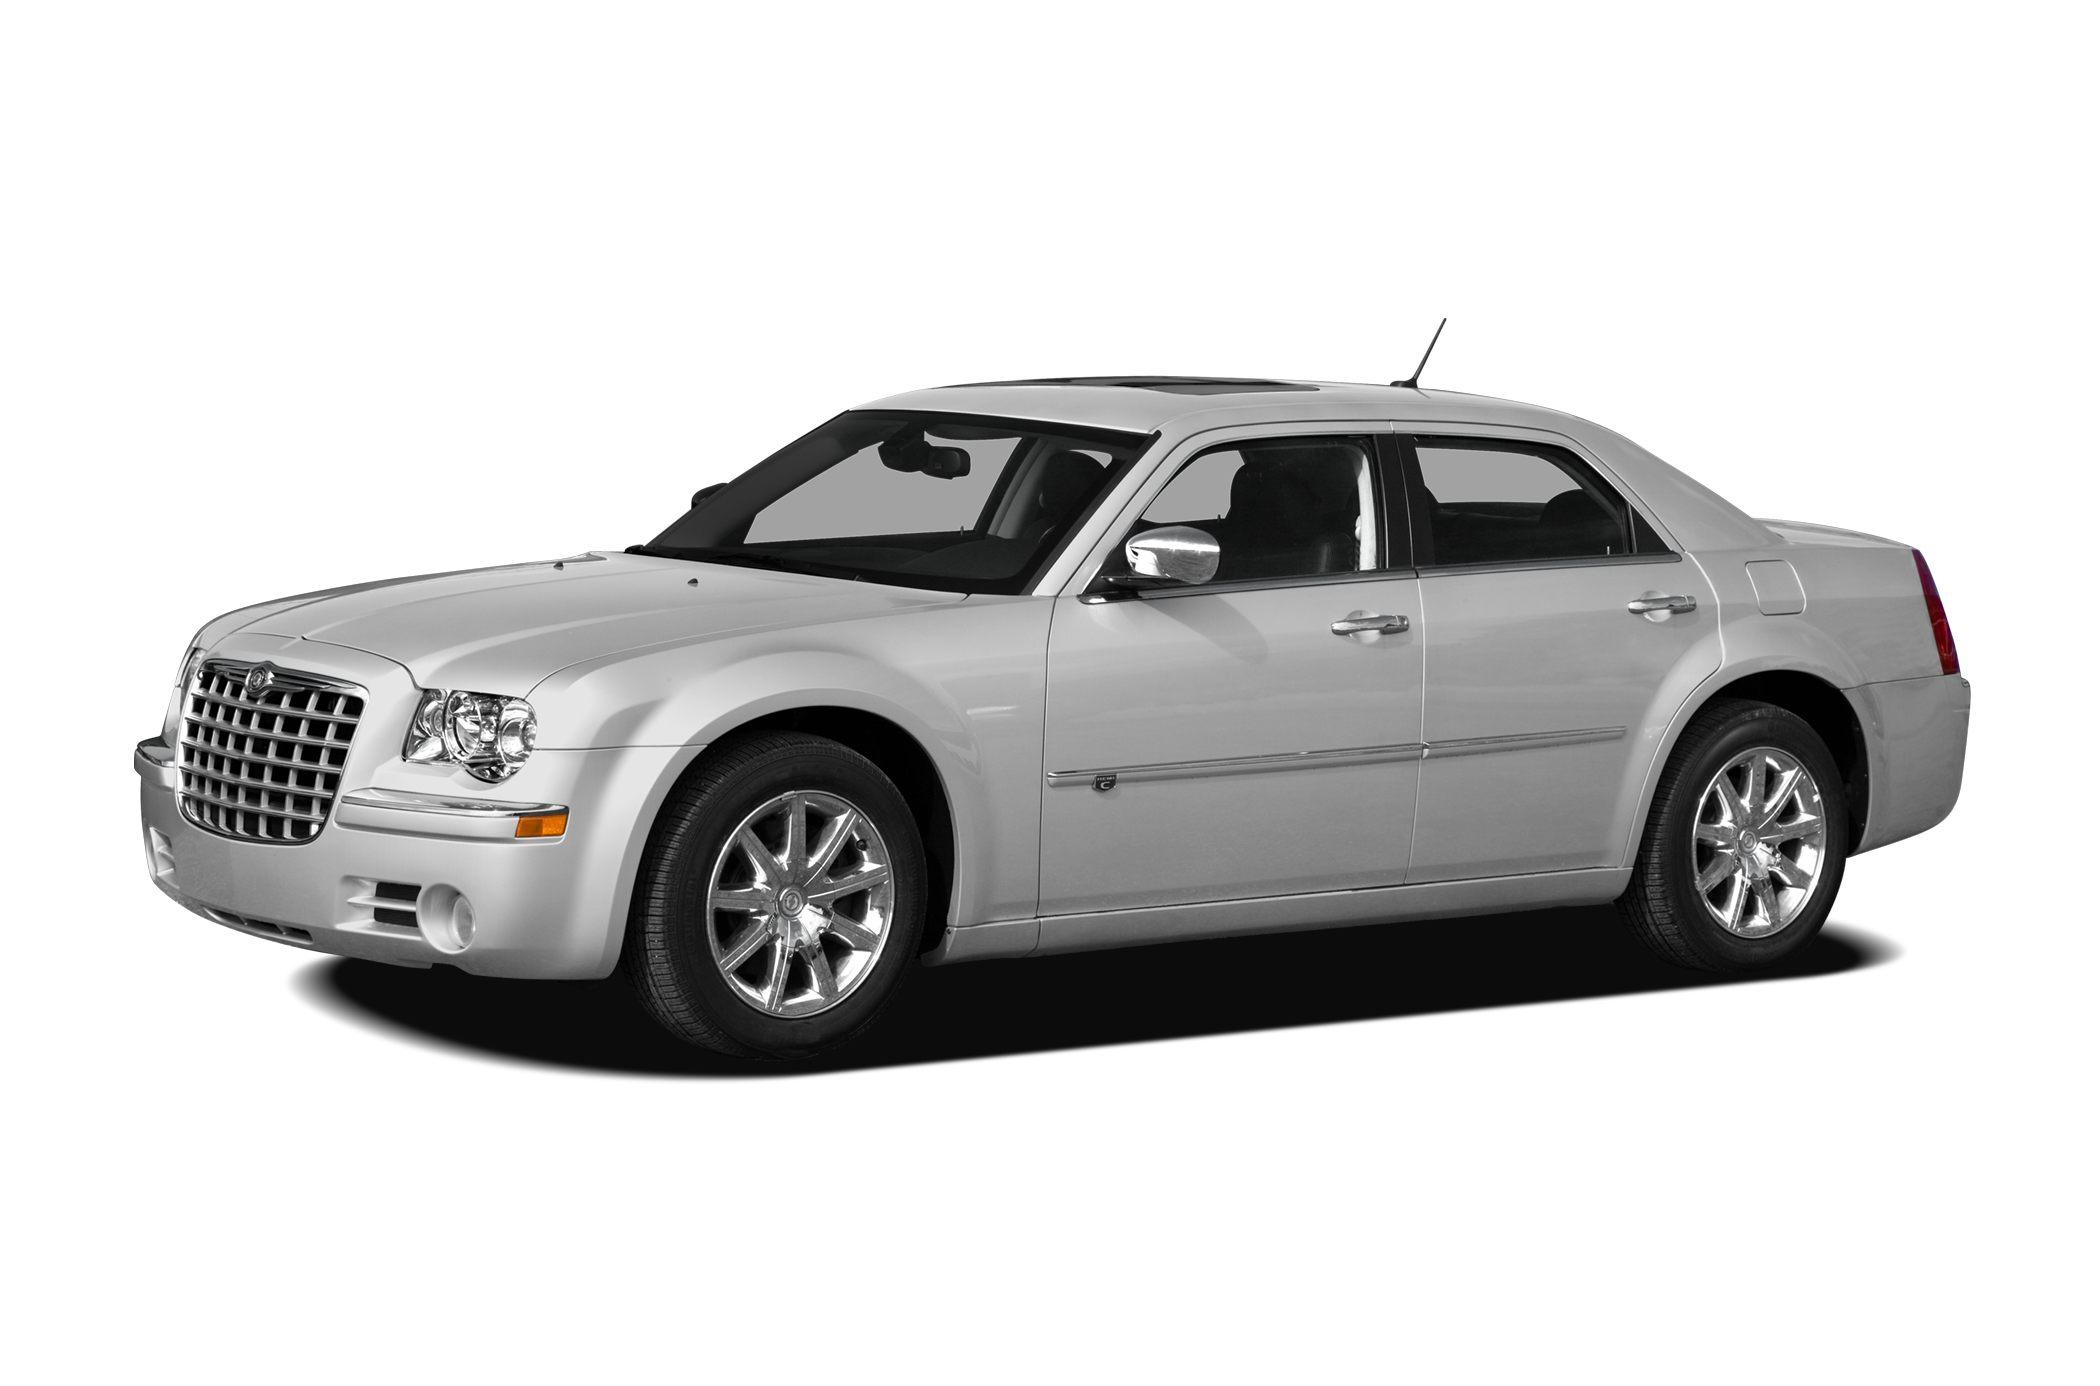 2008 Chrysler 300C Hemi Consumer Guide Best Buy Car 12000 Mile Warranty Heated Leather Seats S